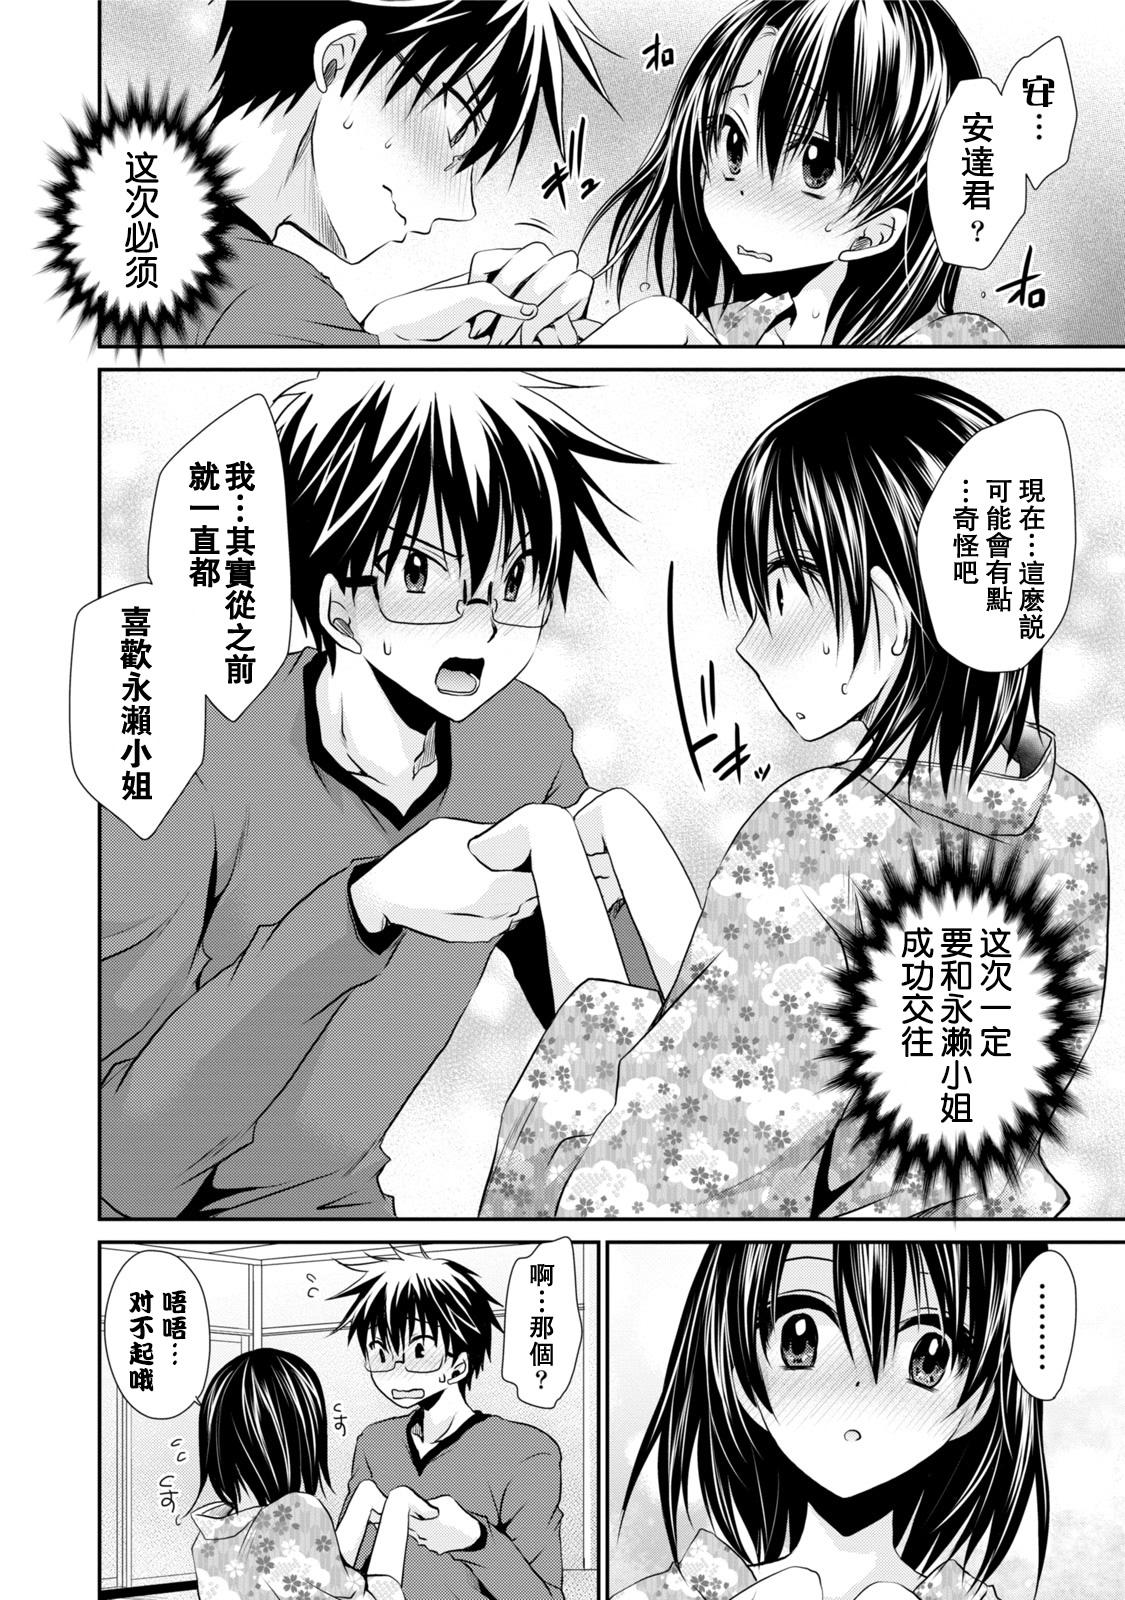 [Shinonome Ryu] Ore to Kanojo to Owaru Sekai - World's end LoveStory ch.1-9 [Chinese] [爱弹幕汉化组] [Digital] 167